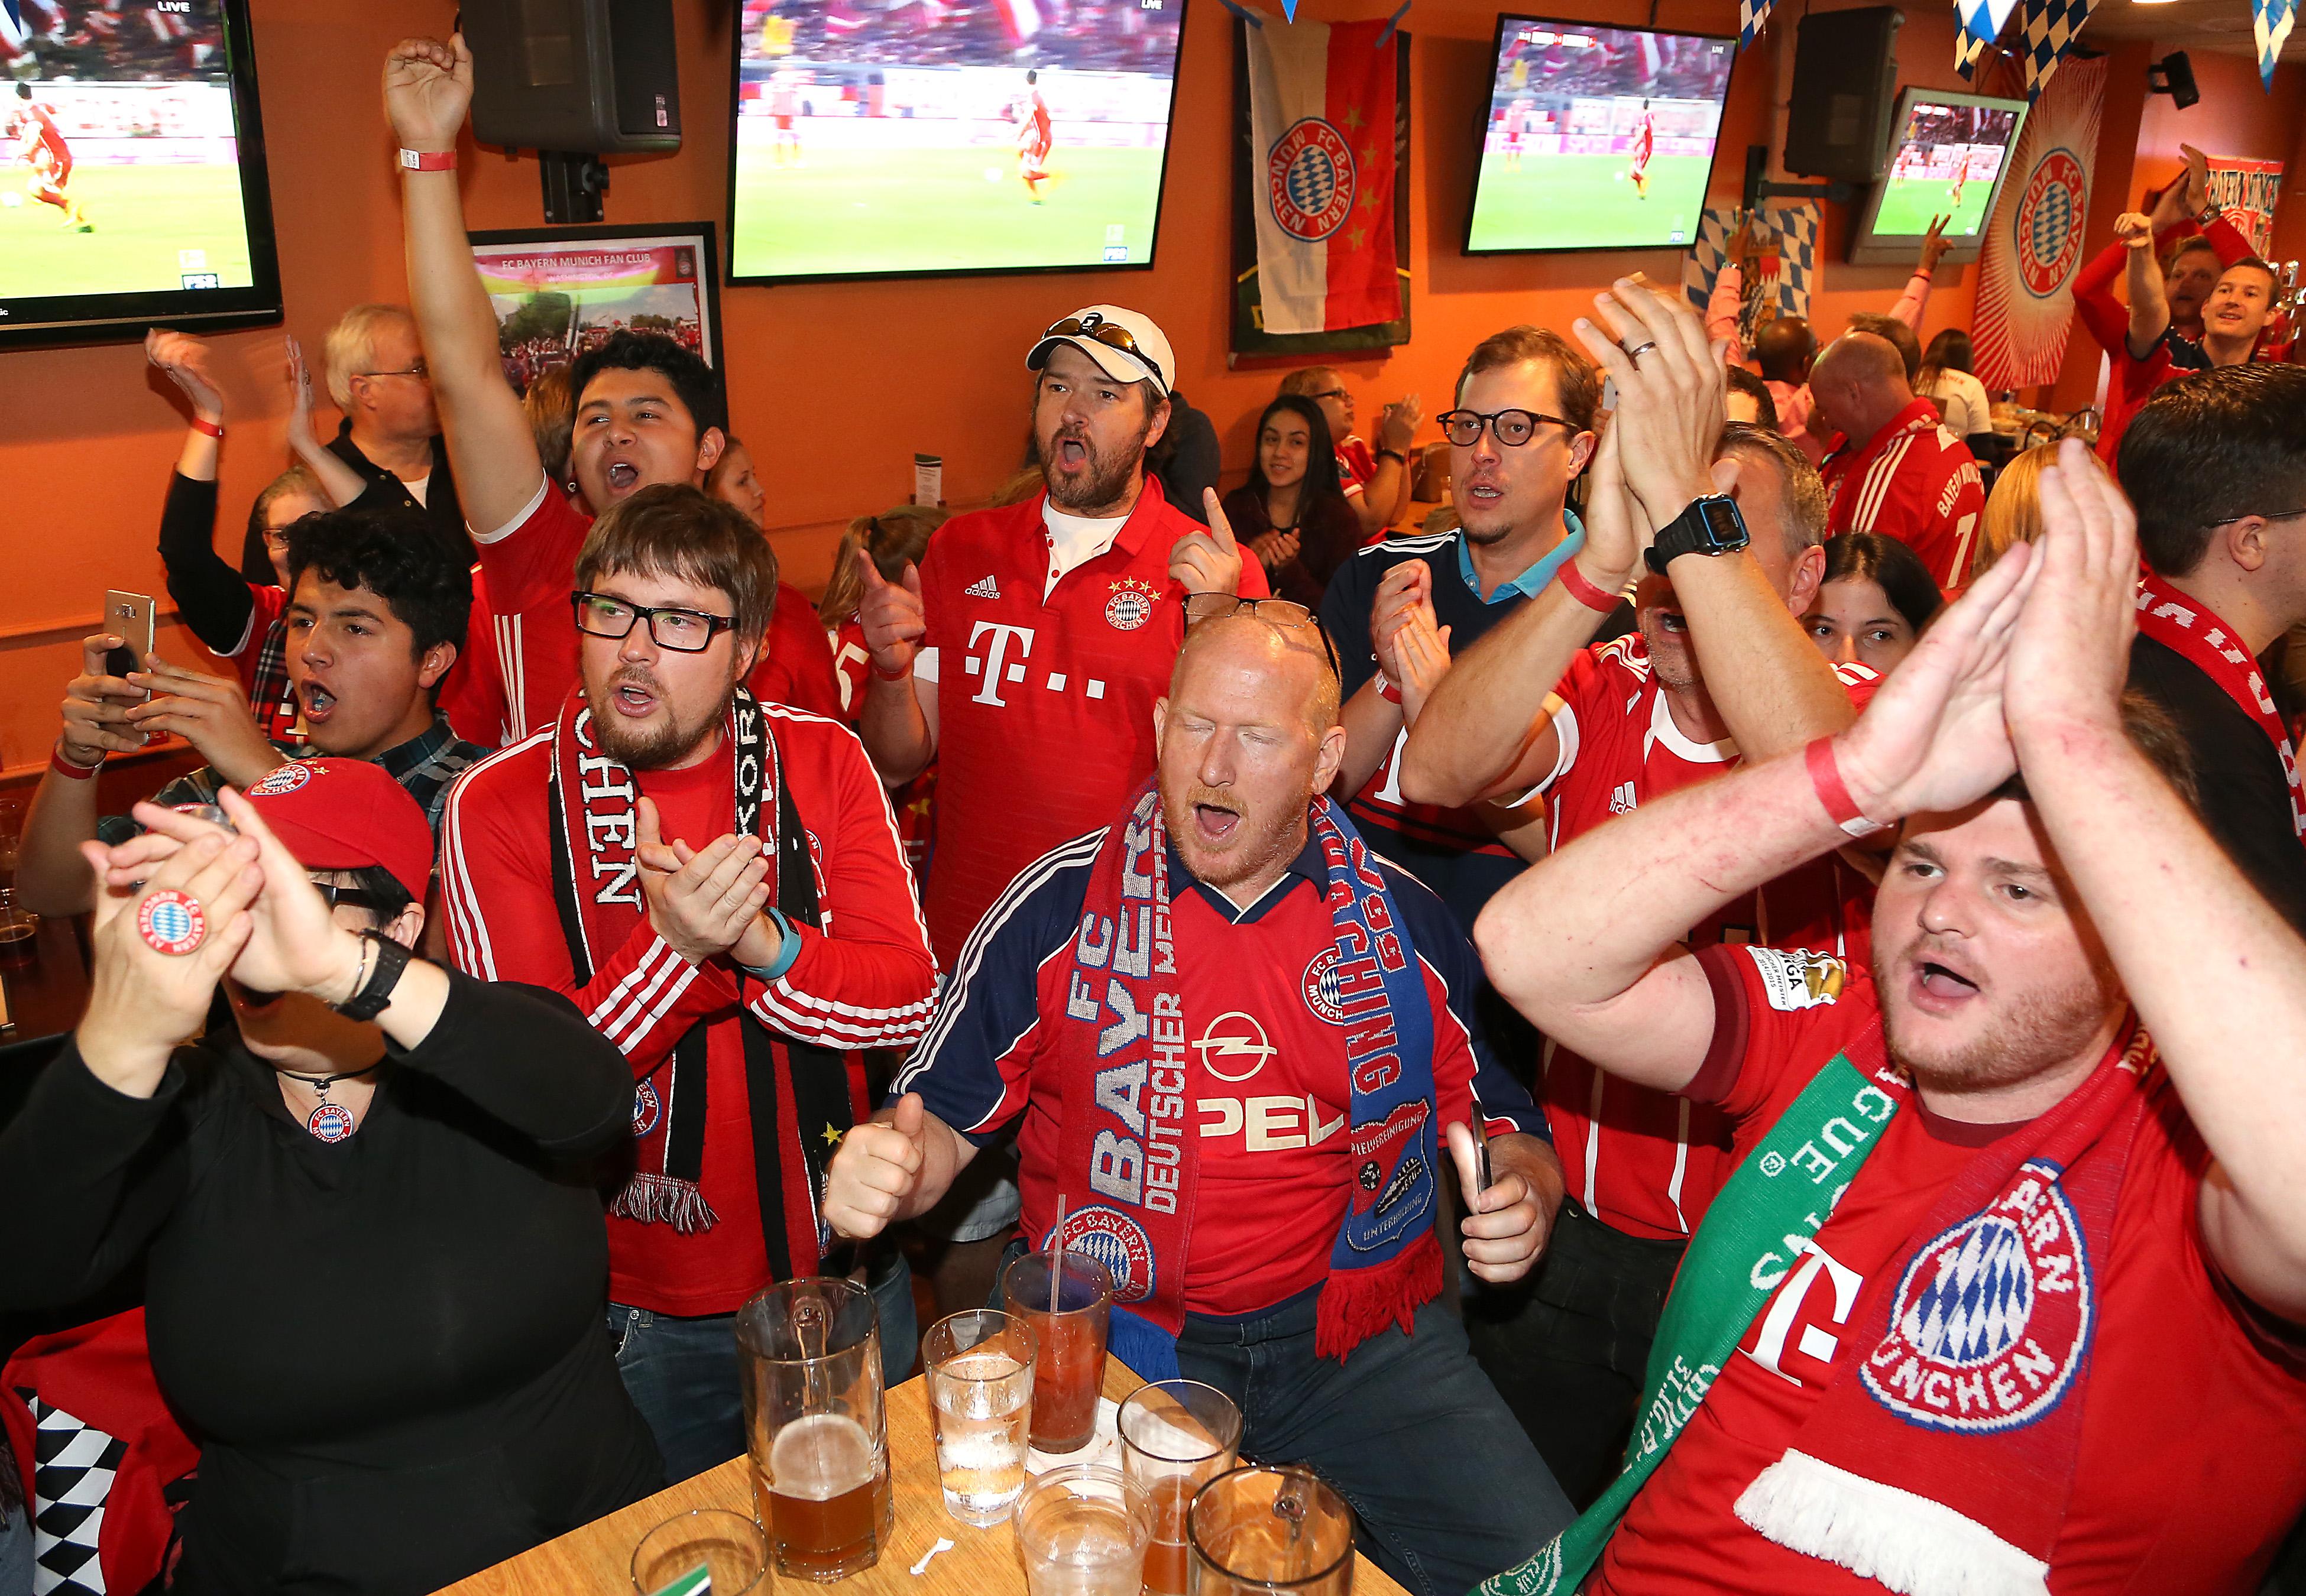 Bayern Munich supporters revel at D.C. fan club meet-up